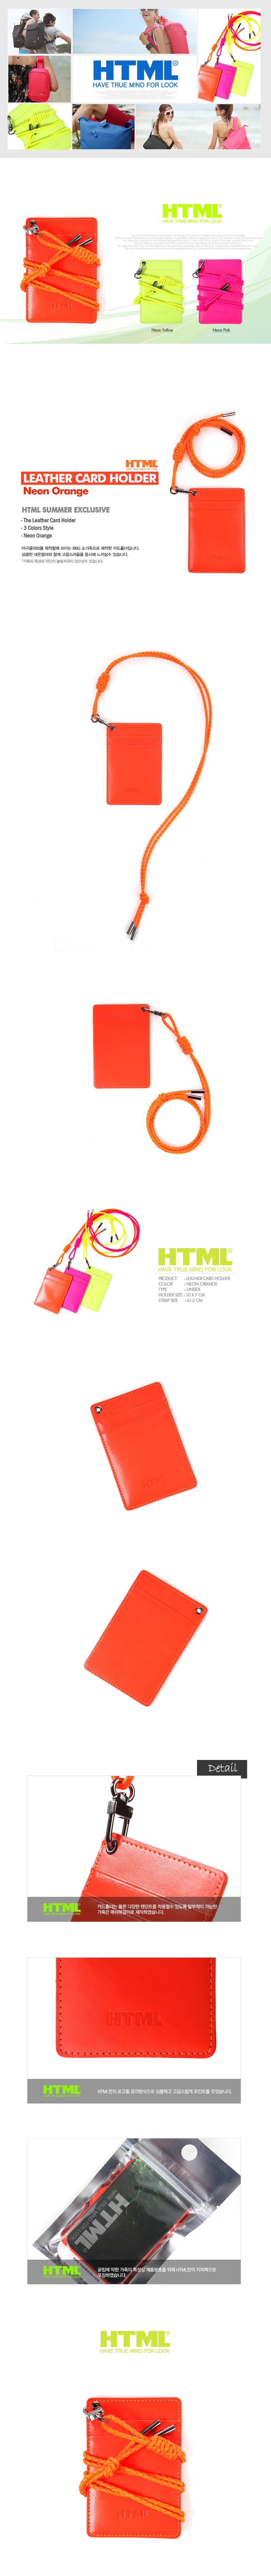 HTML - Leather holder (Neon Orange)